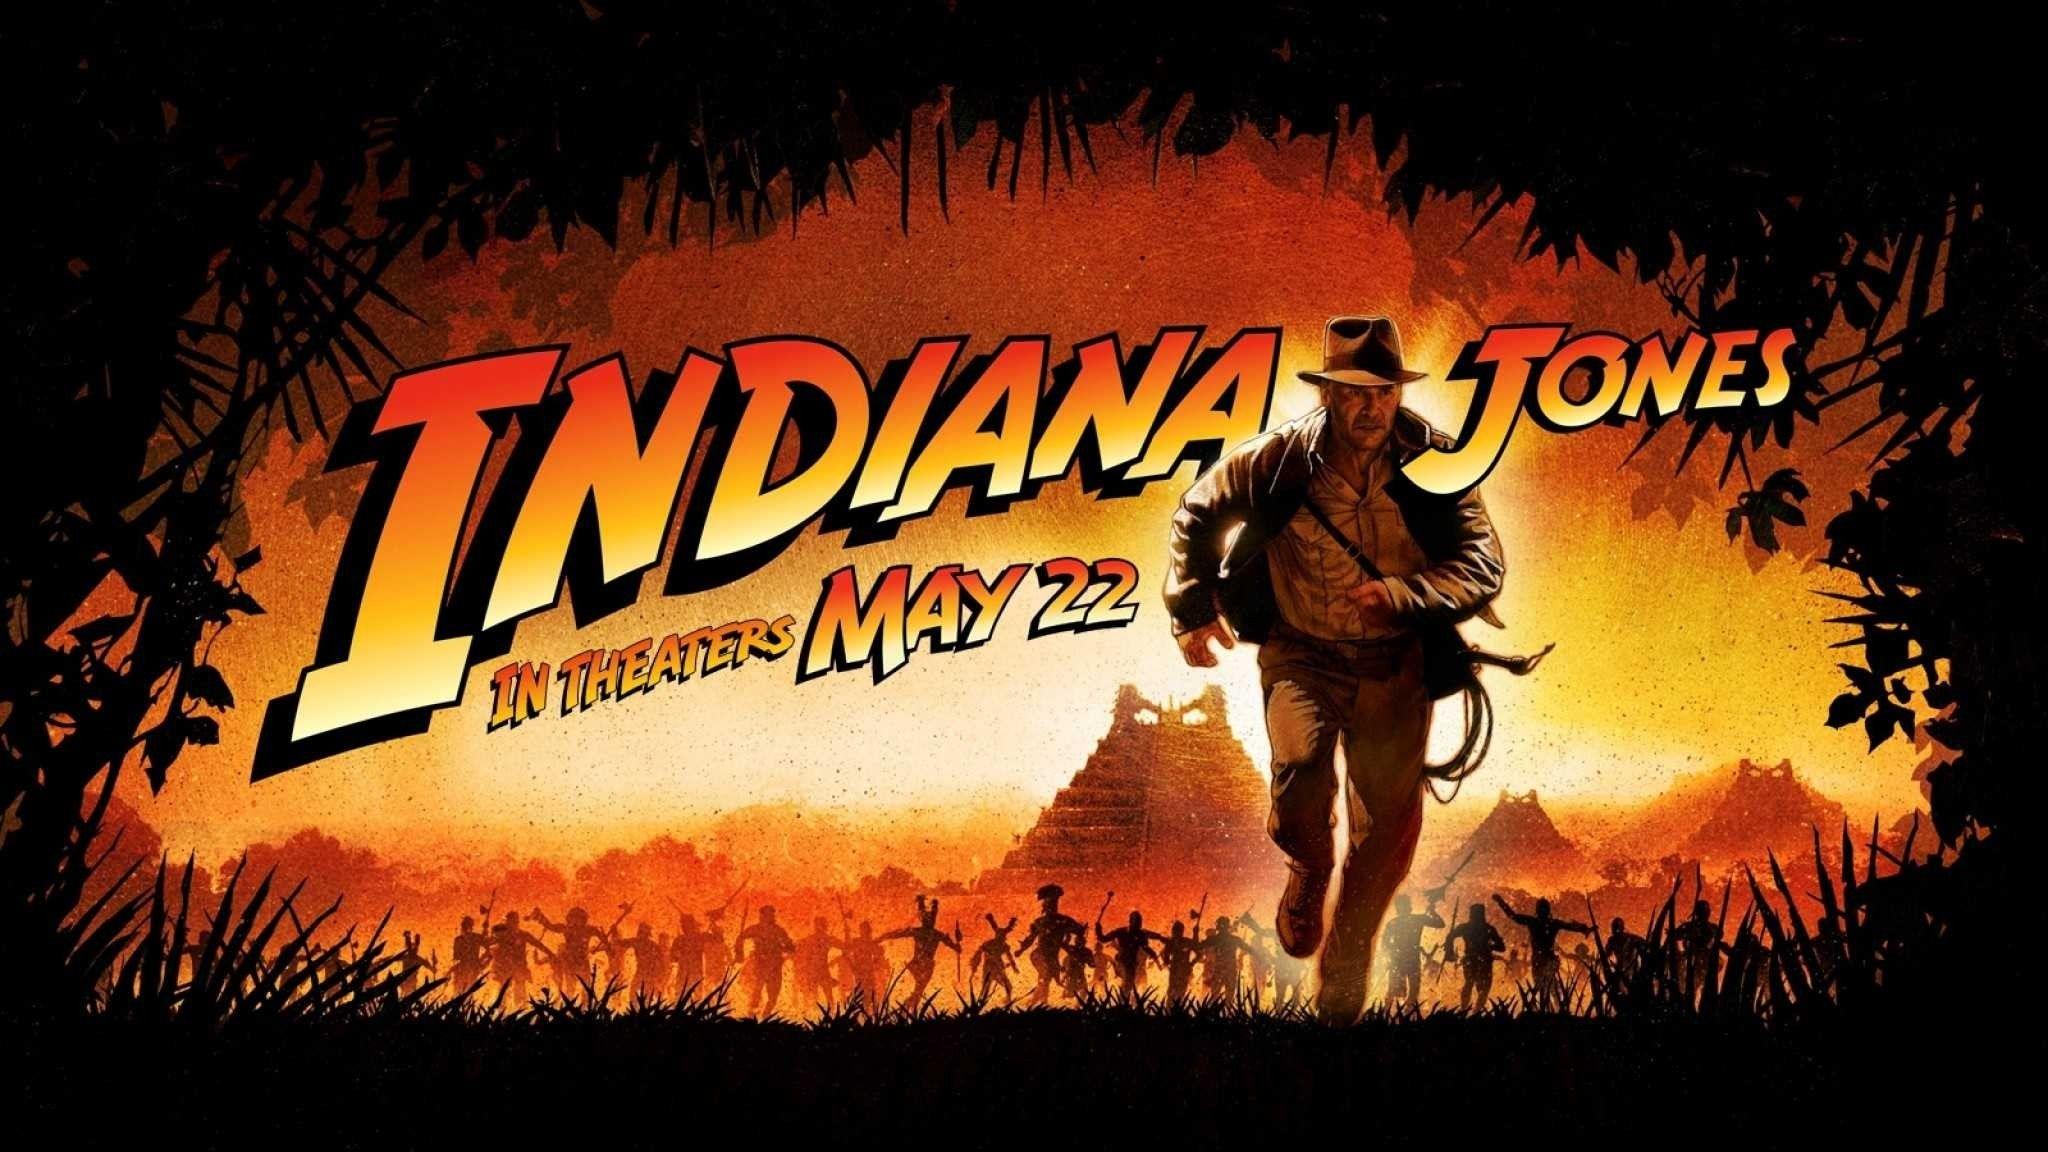 Pin by TheParademon14 on Indiana Jones Indiana jones